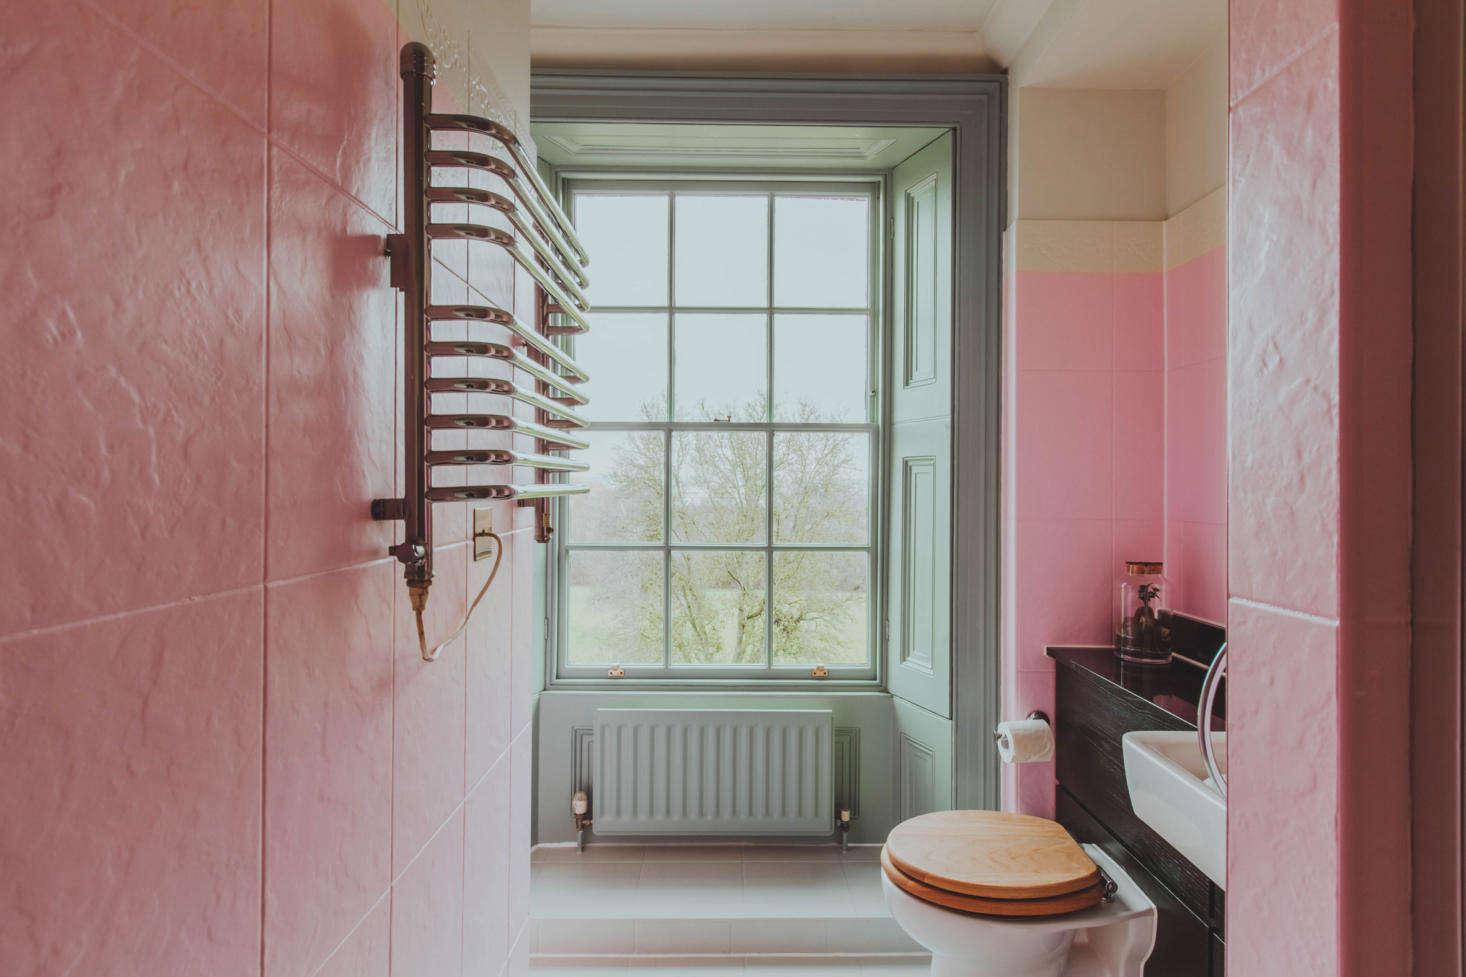 A bright pink tiled bath.